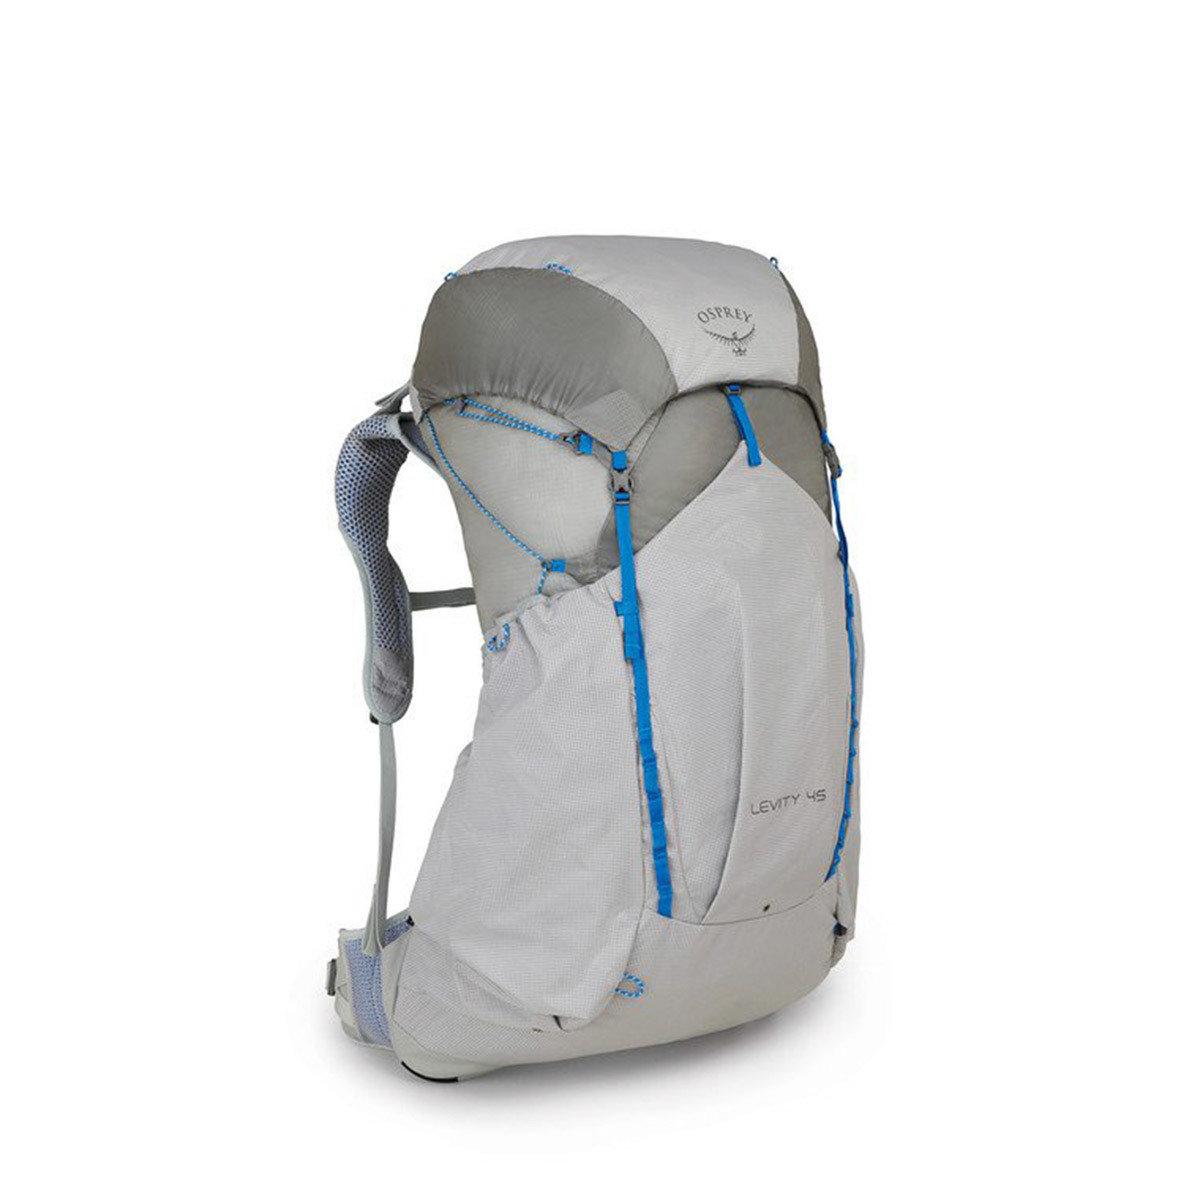 Osprey Levity 45 Superultralight Backpack